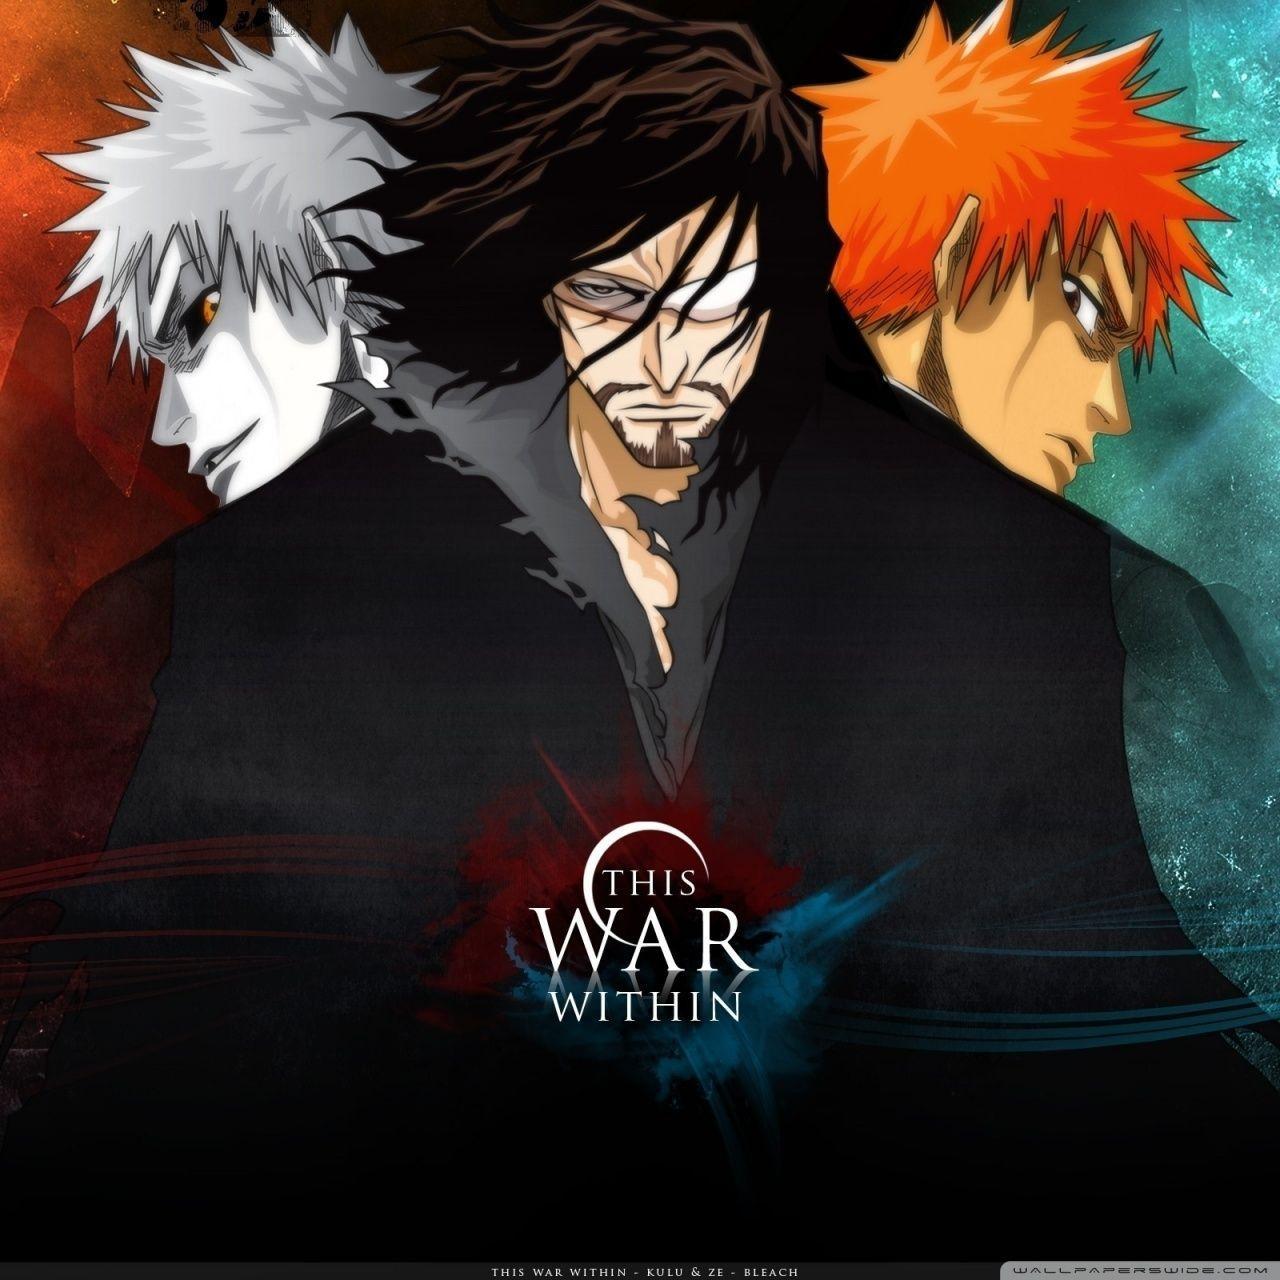 Bleach Anime Desktop Wallpapers - Top Free Bleach Anime ...